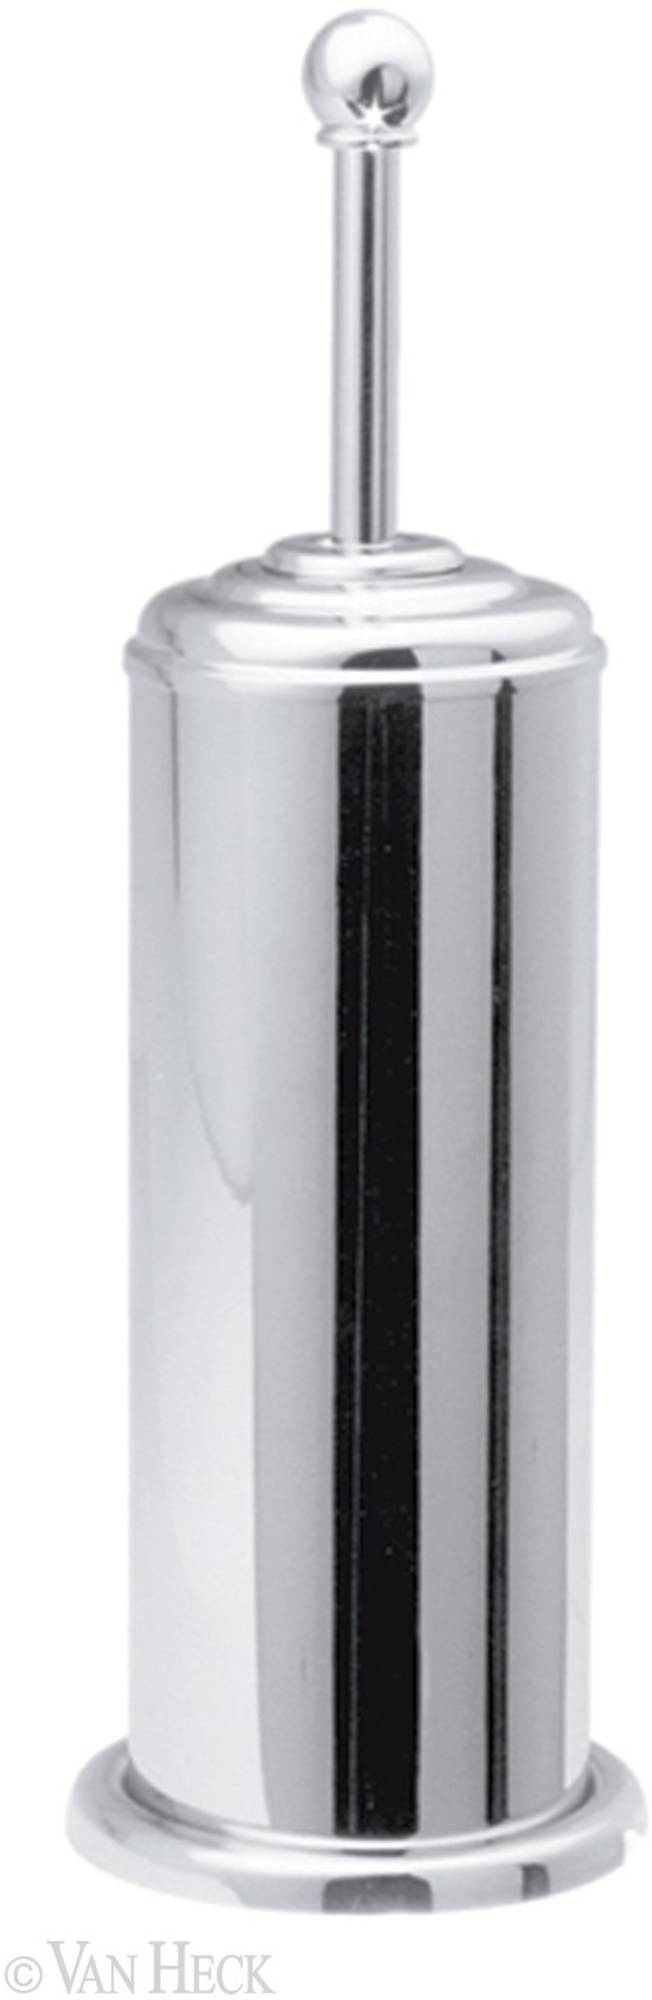 Van Heck Traditional borstelgarnituur 11,5x35x11,5 chroom